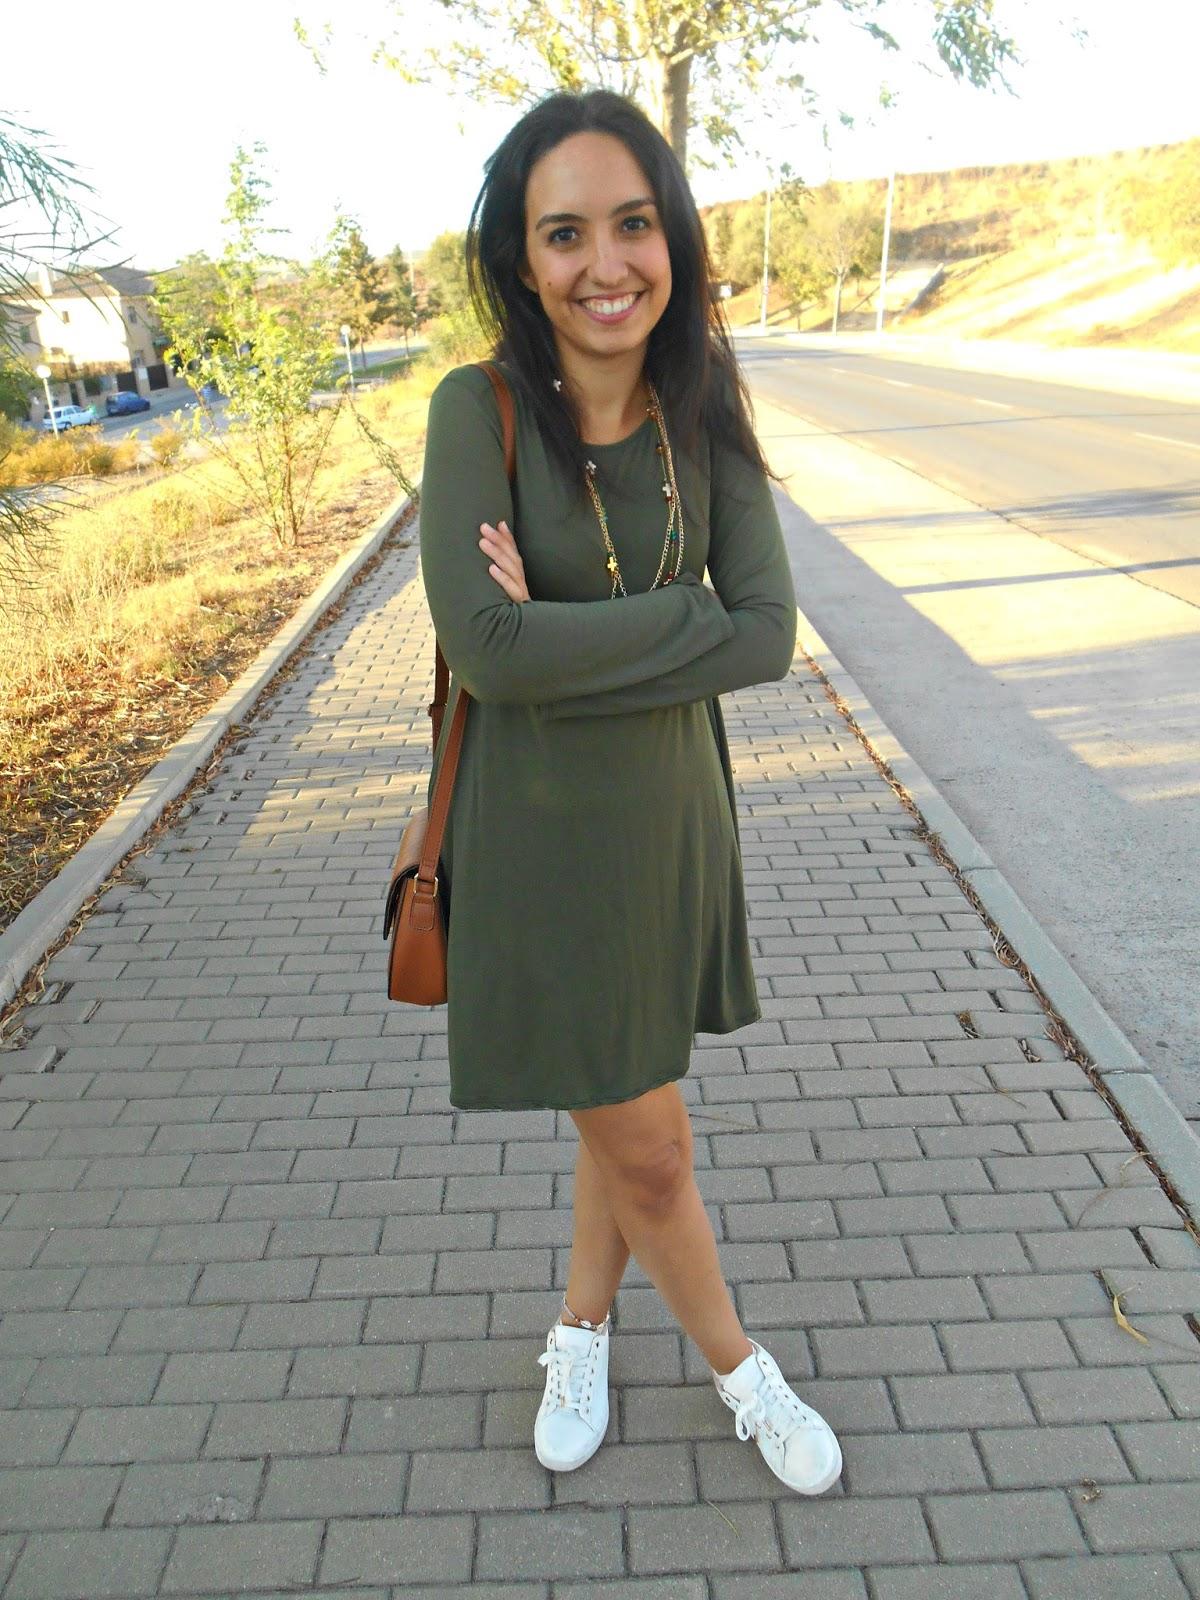 Vestido/Dress La Boutique de Juana Sotot (tienda local)